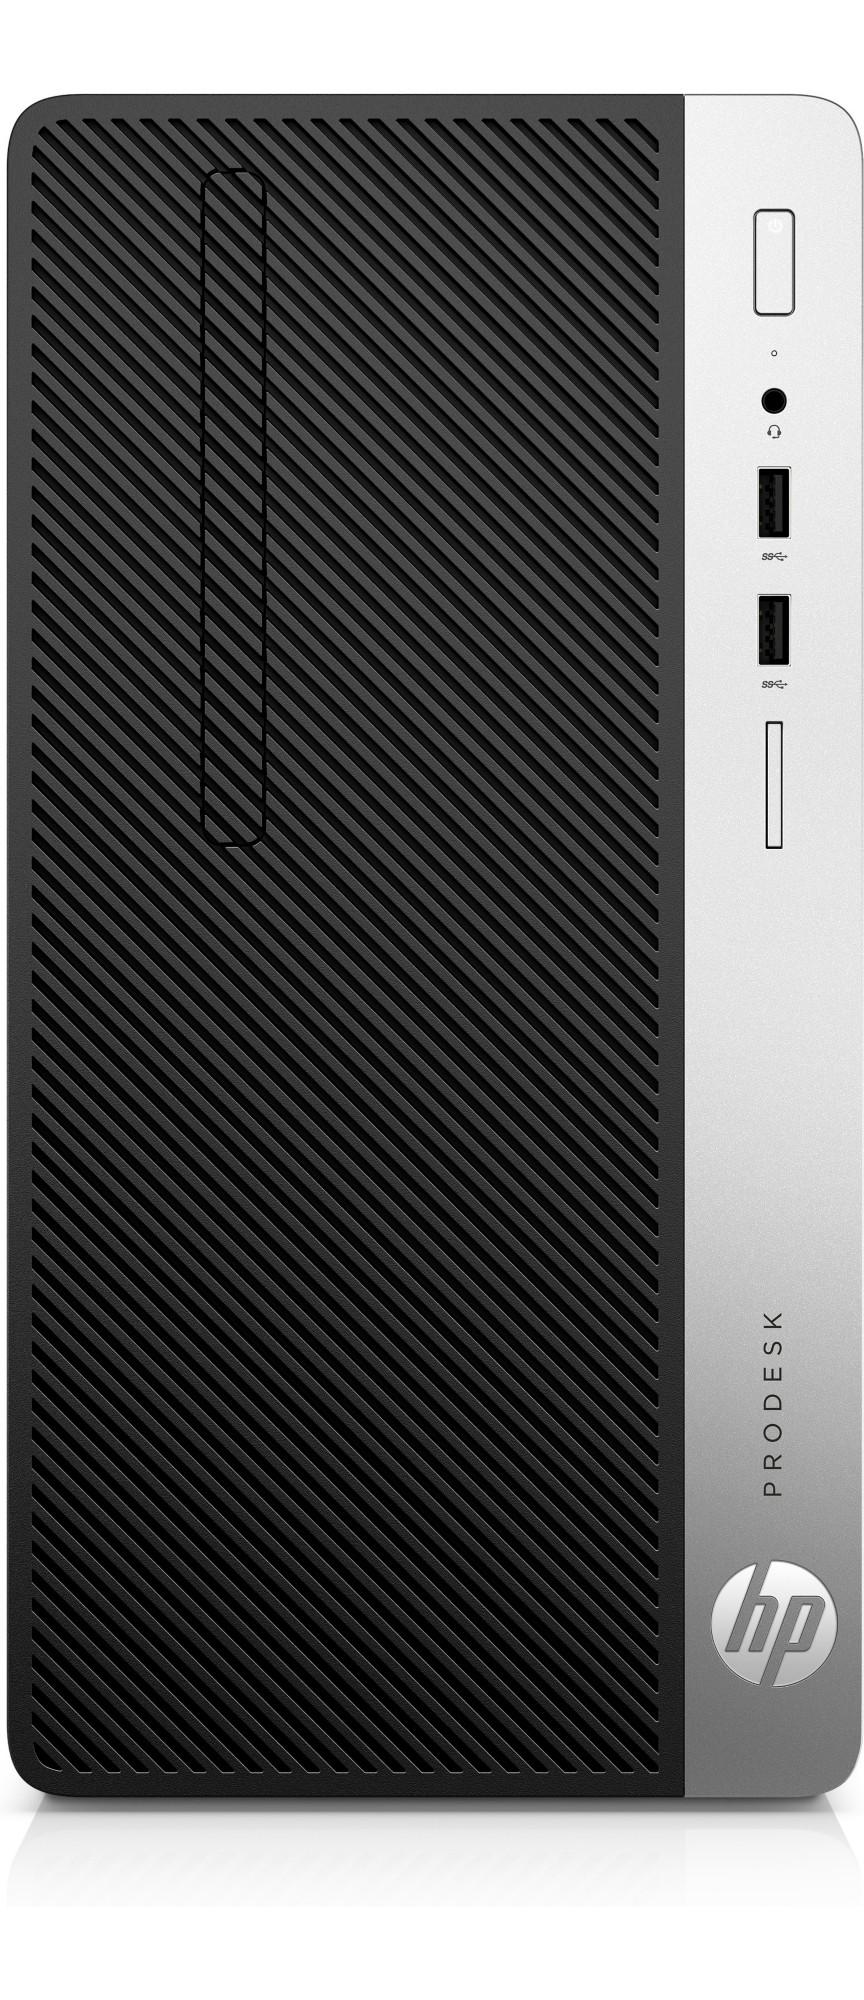 HP ProDesk 400 G6 9th gen Intel® Core™ i5 i5-9500 8 GB DDR4-SDRAM 256 GB SSD Zwart, Zilver Micro Tower PC